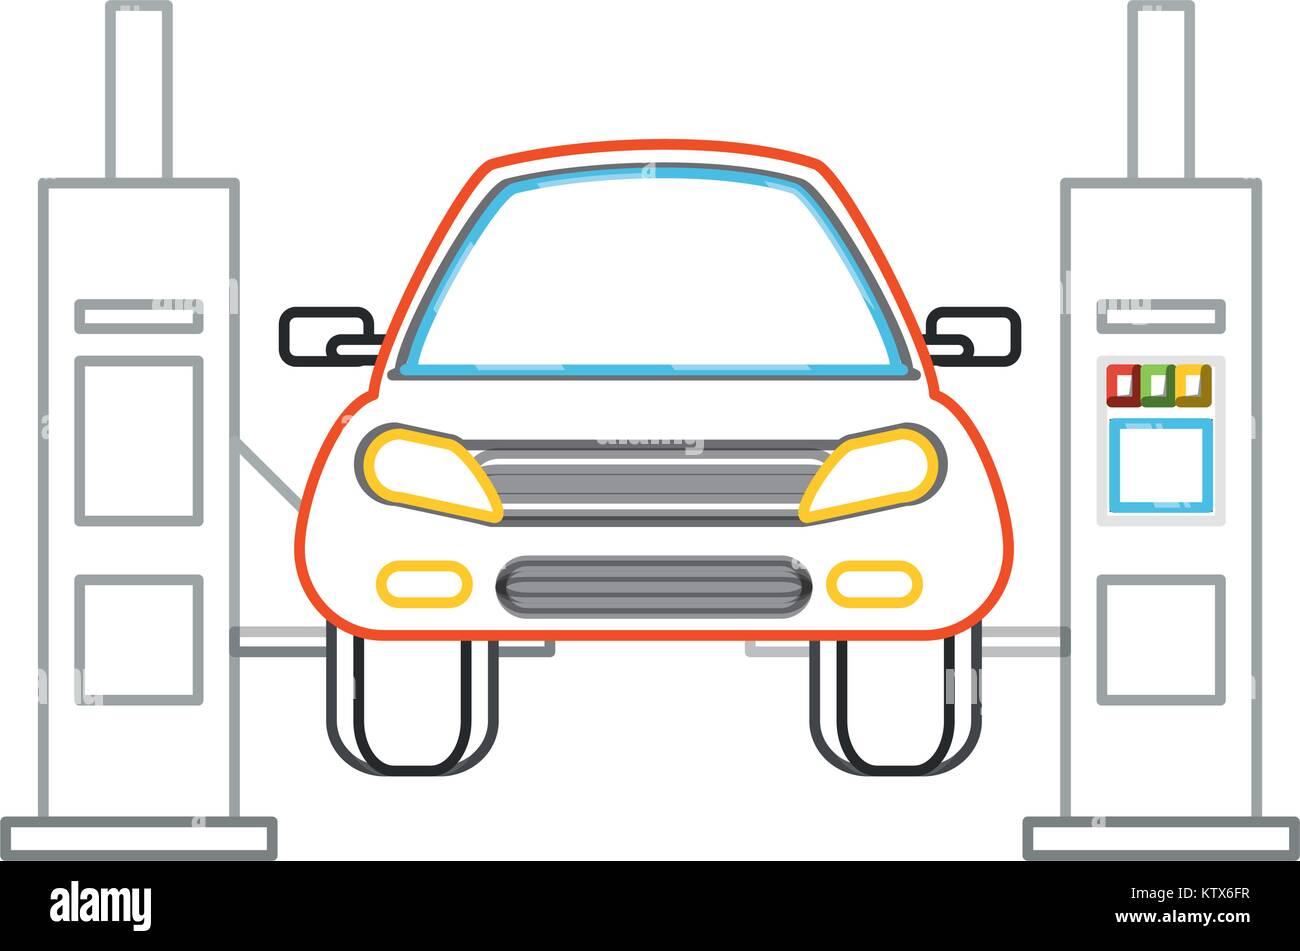 car lift machine icon Stock Vector Art & Illustration